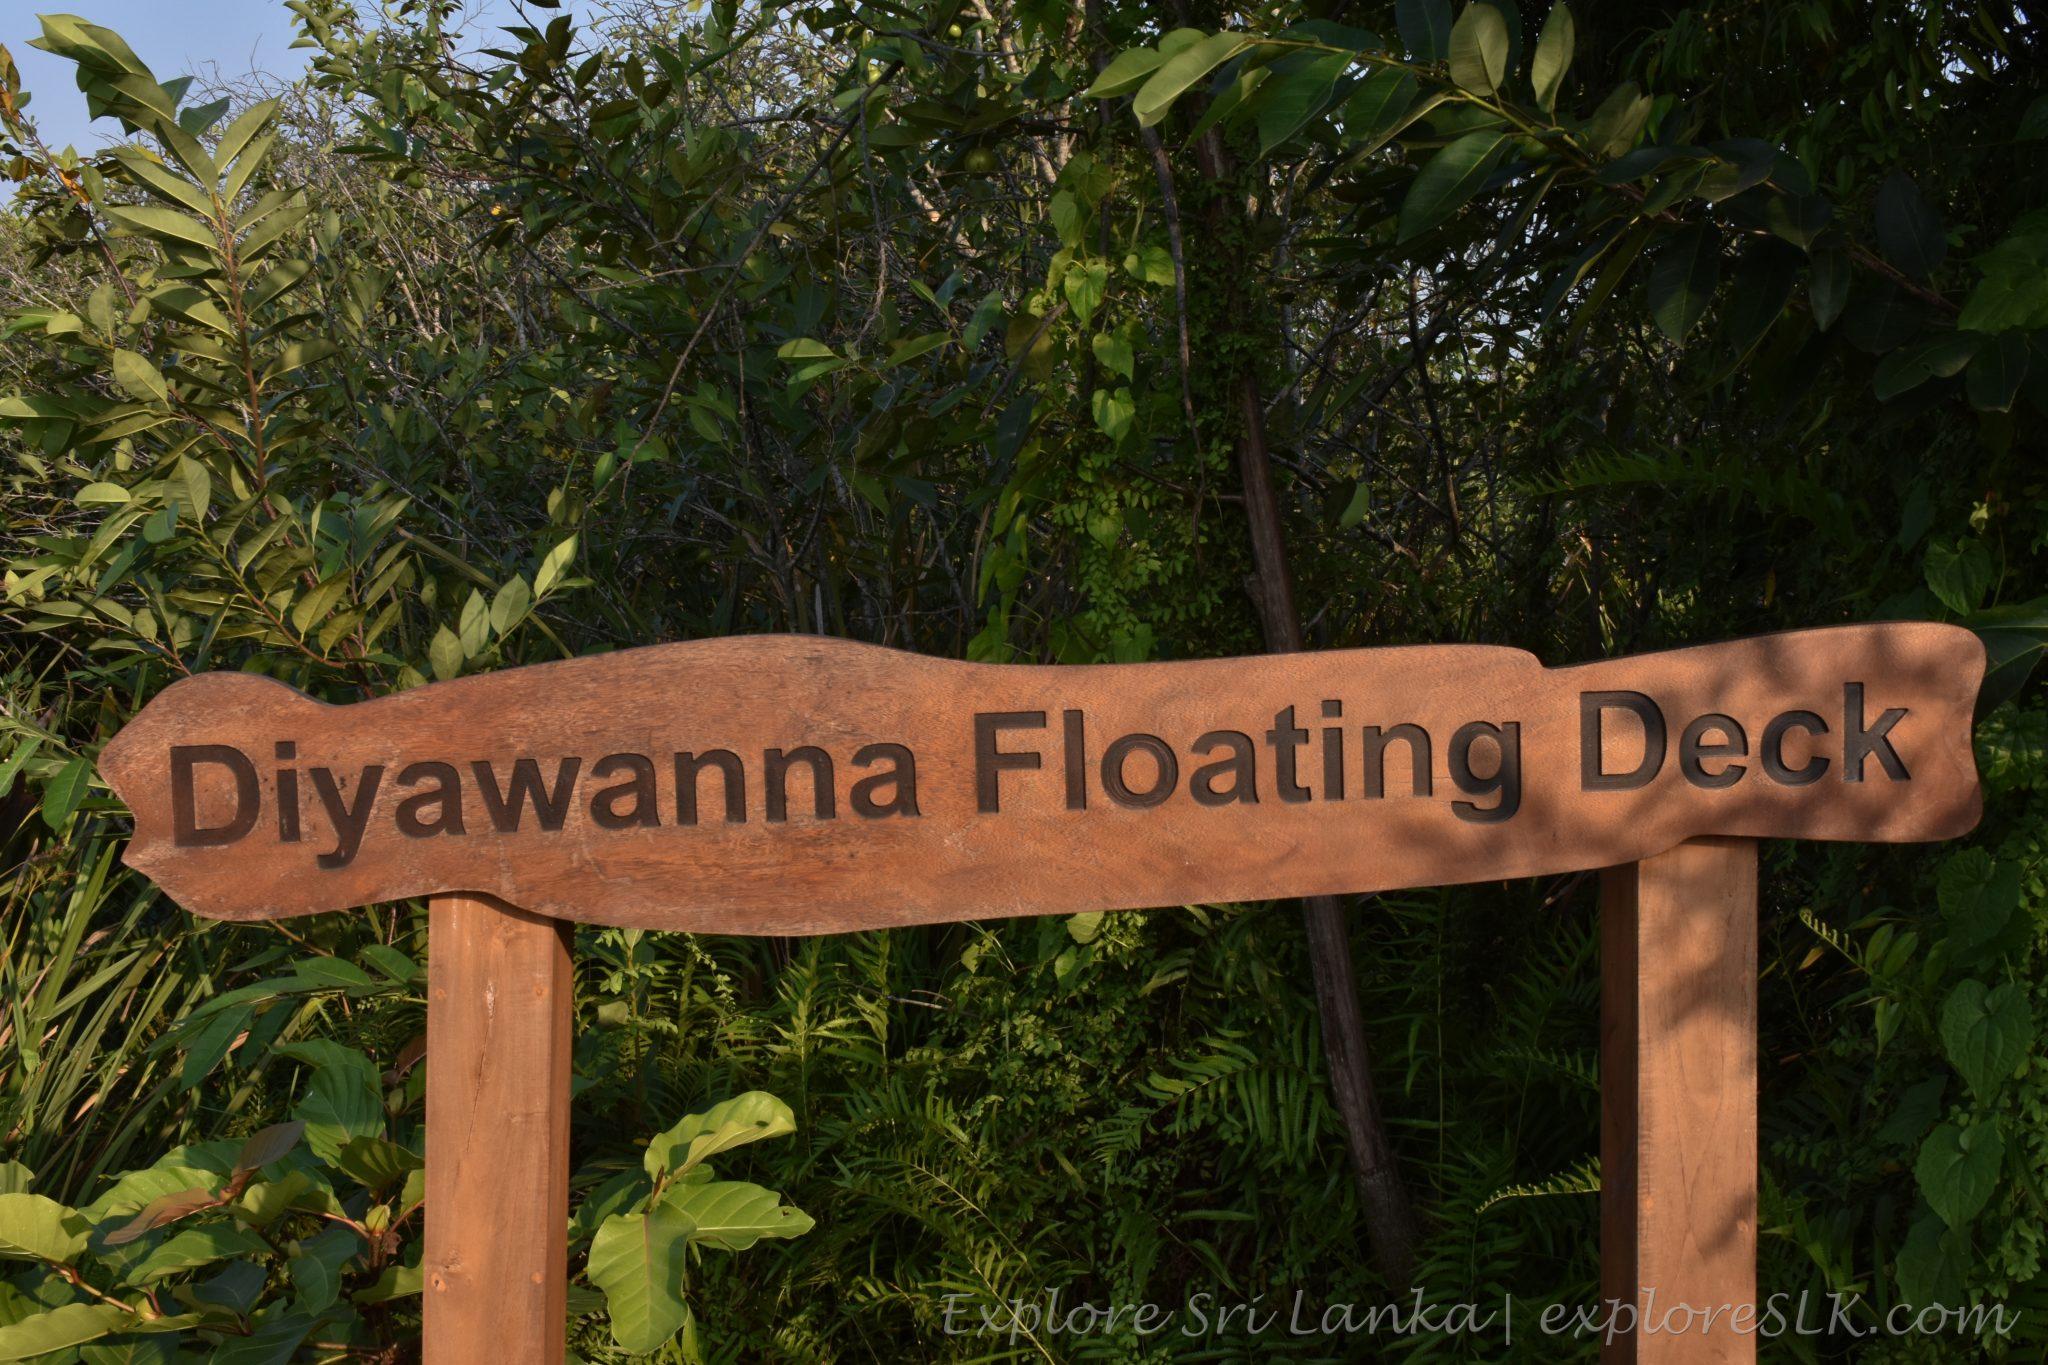 Diyawanna floating deck - sign board